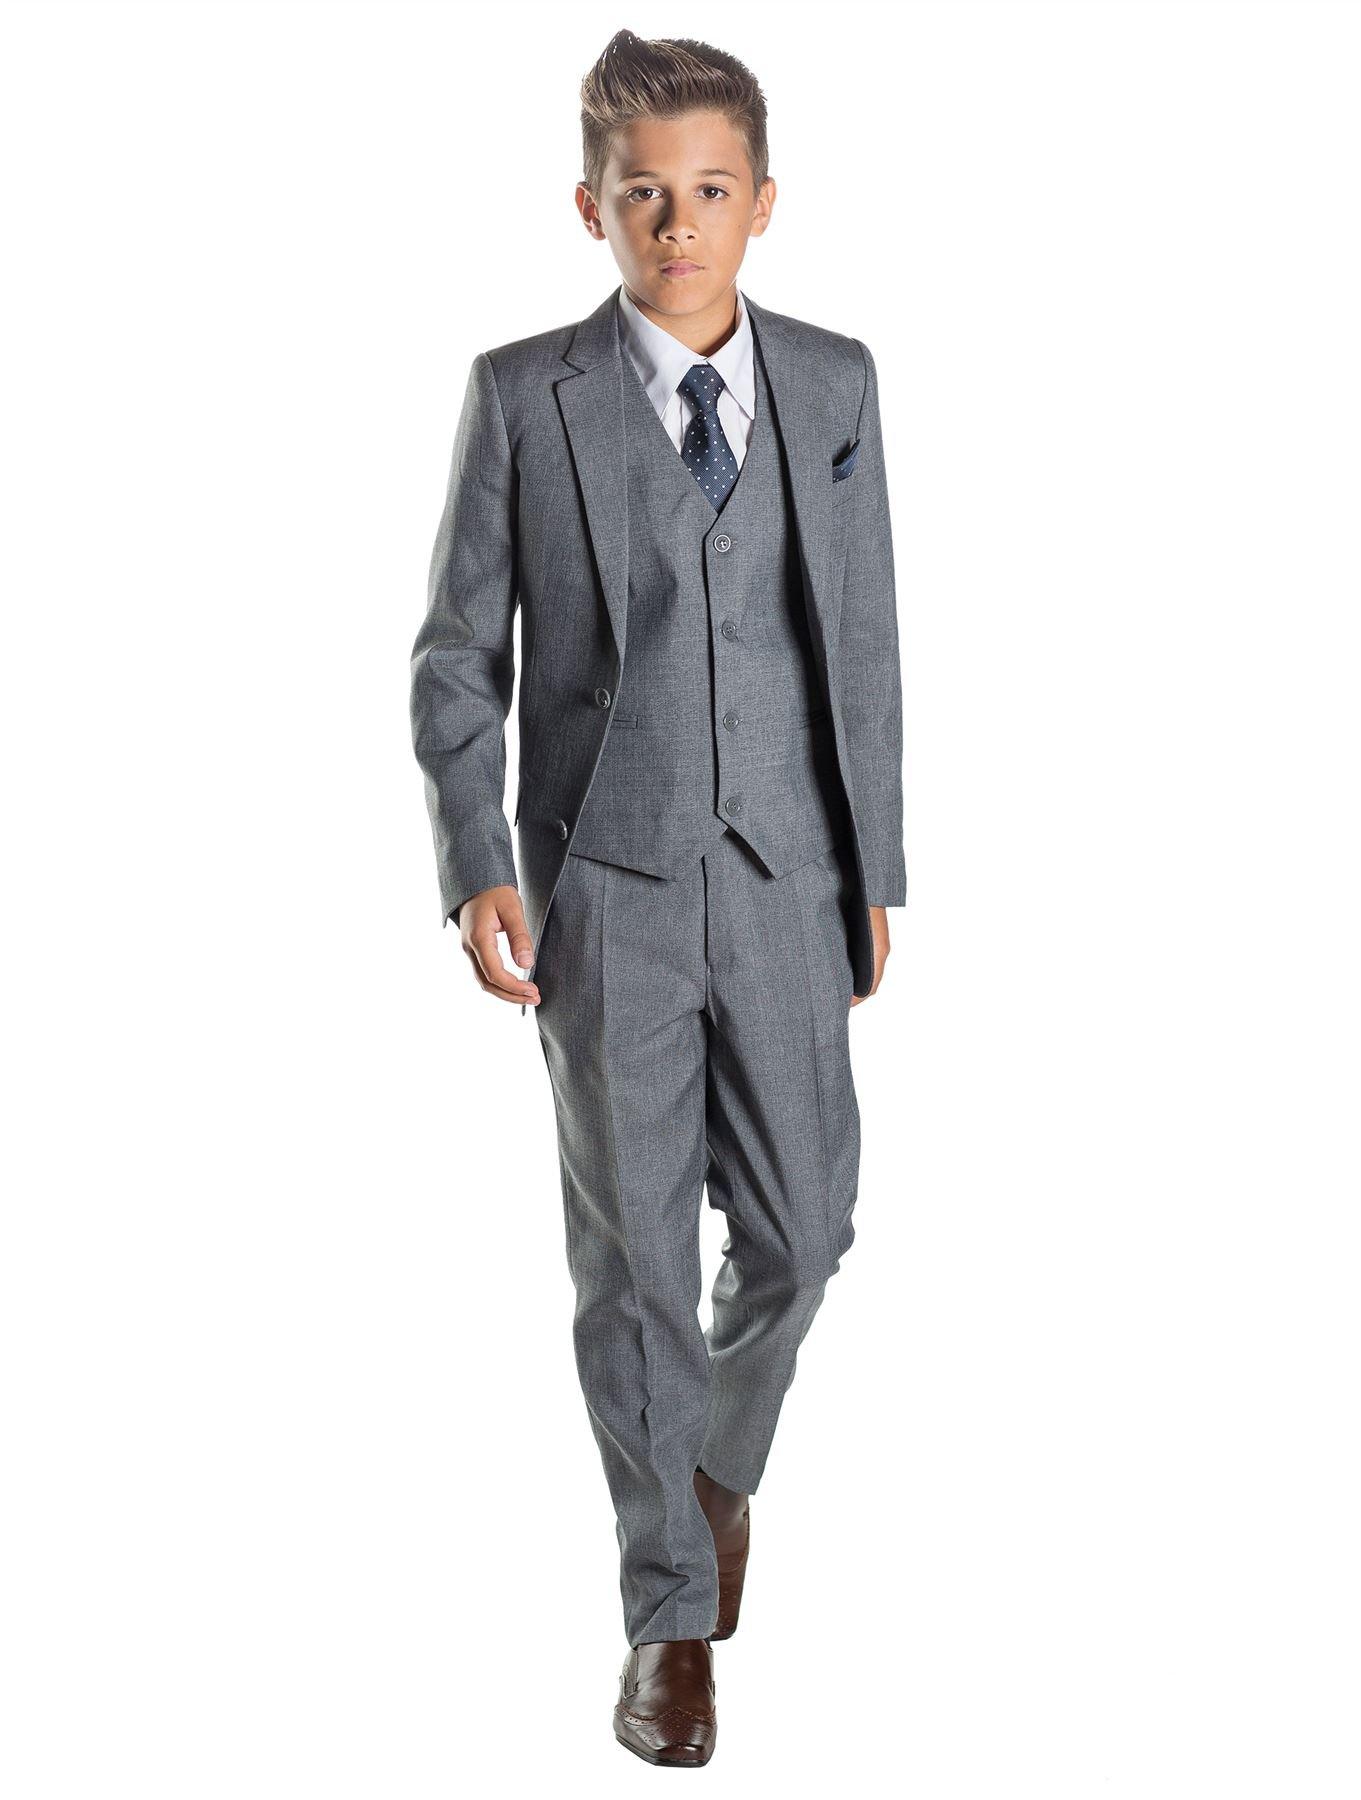 Paisley of London Boys Grey Ring Bearer Suit, 16